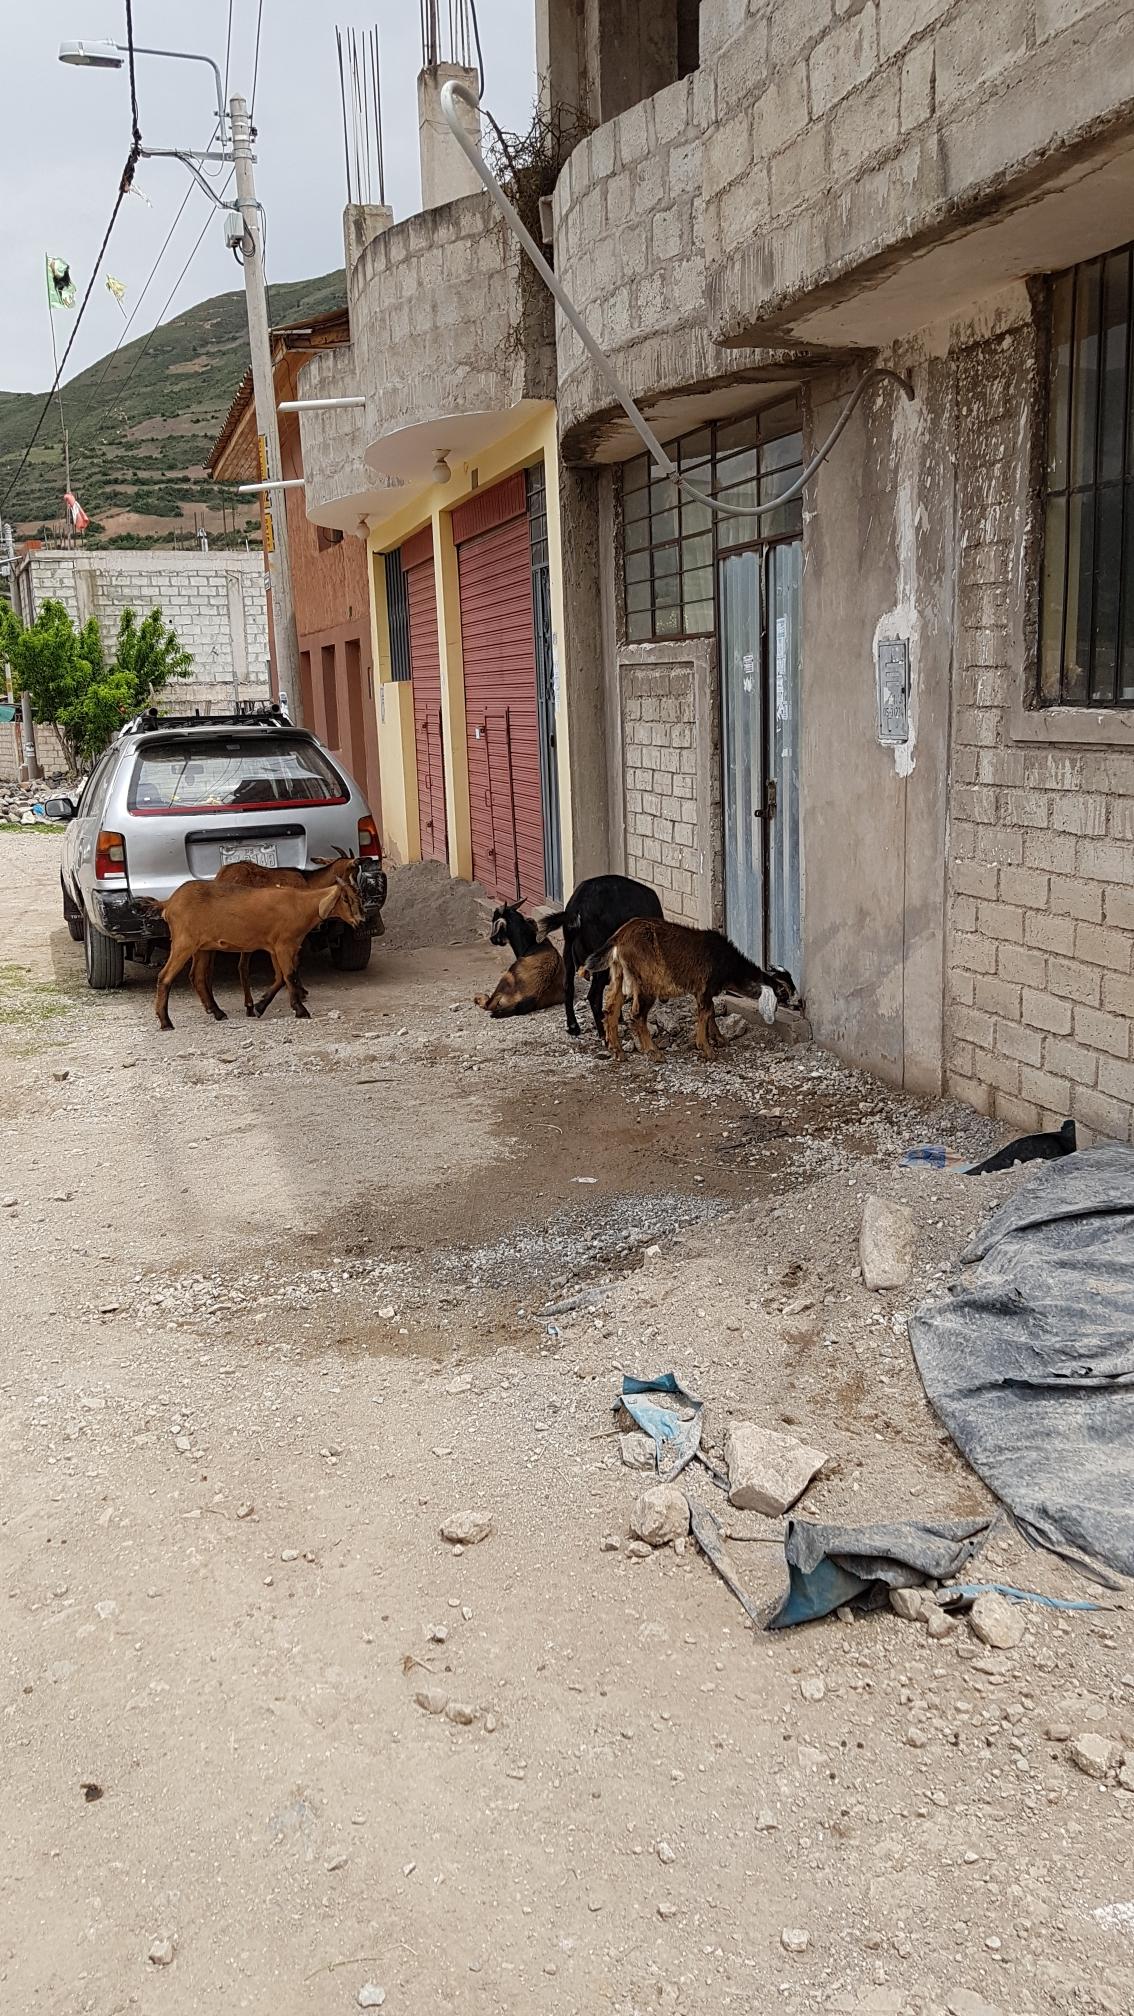 Ziegen ziehen unsere Straße entlang.